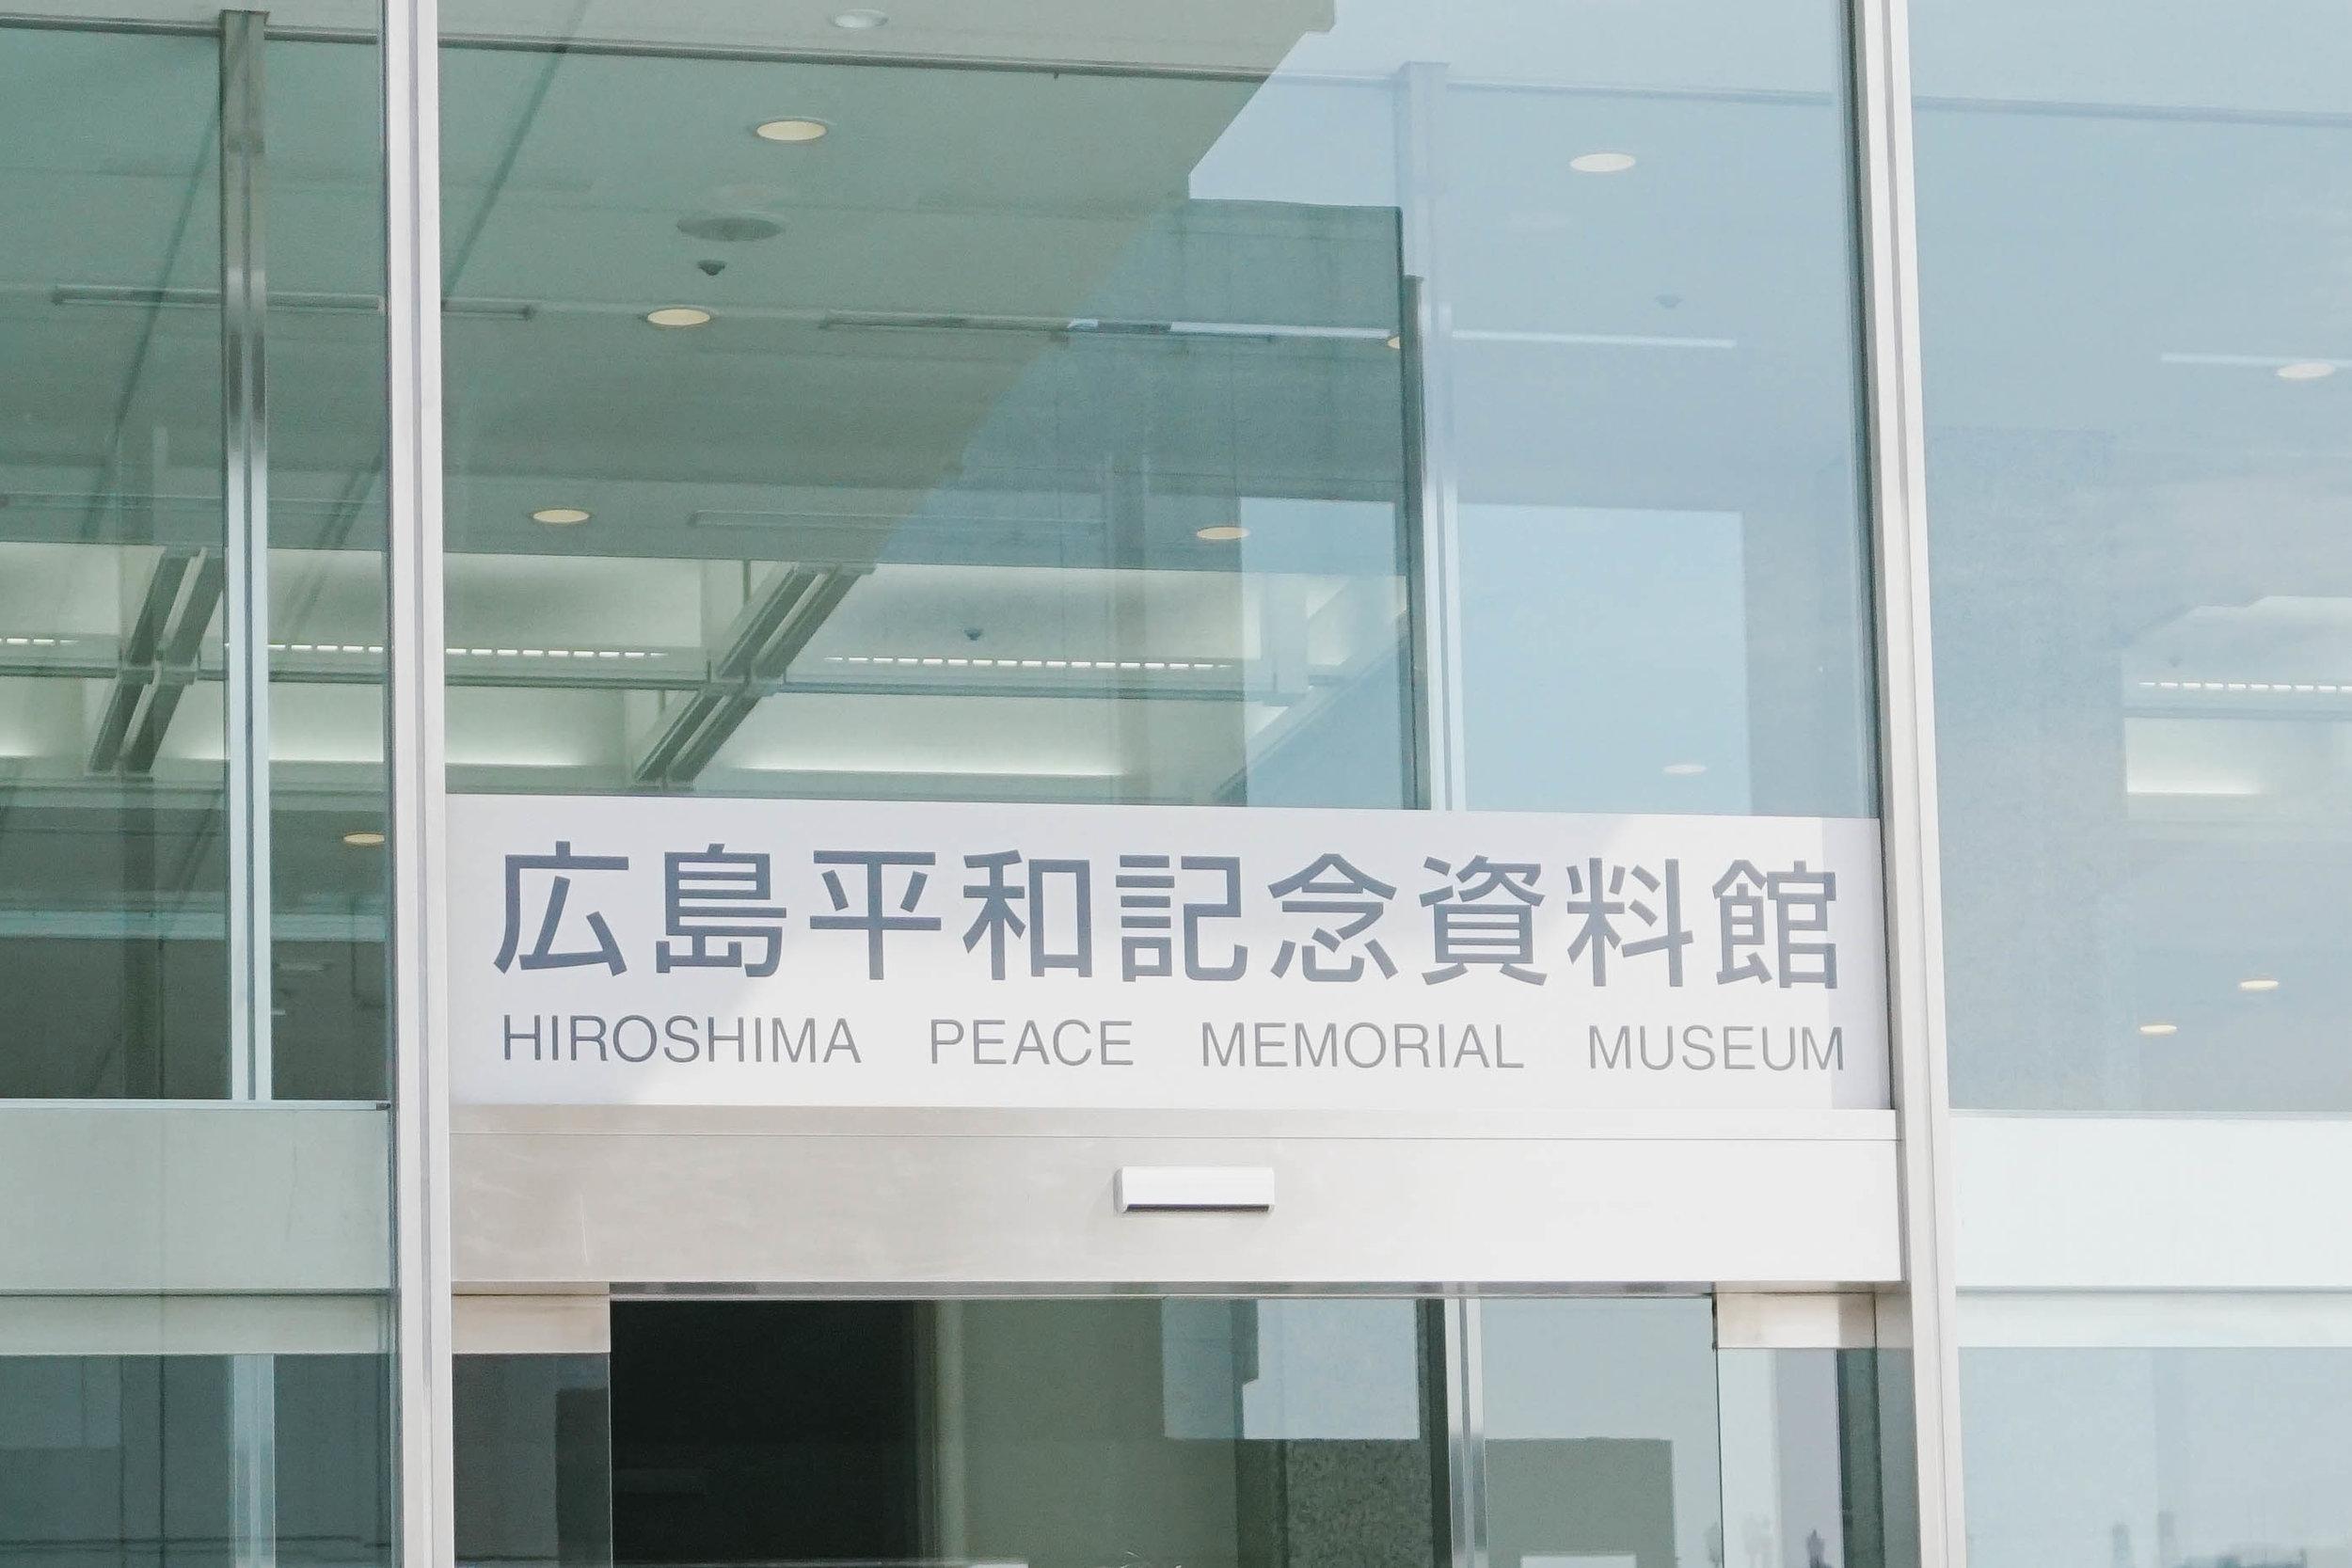 Entrance to the Hiroshima Peace Memorial Museum.